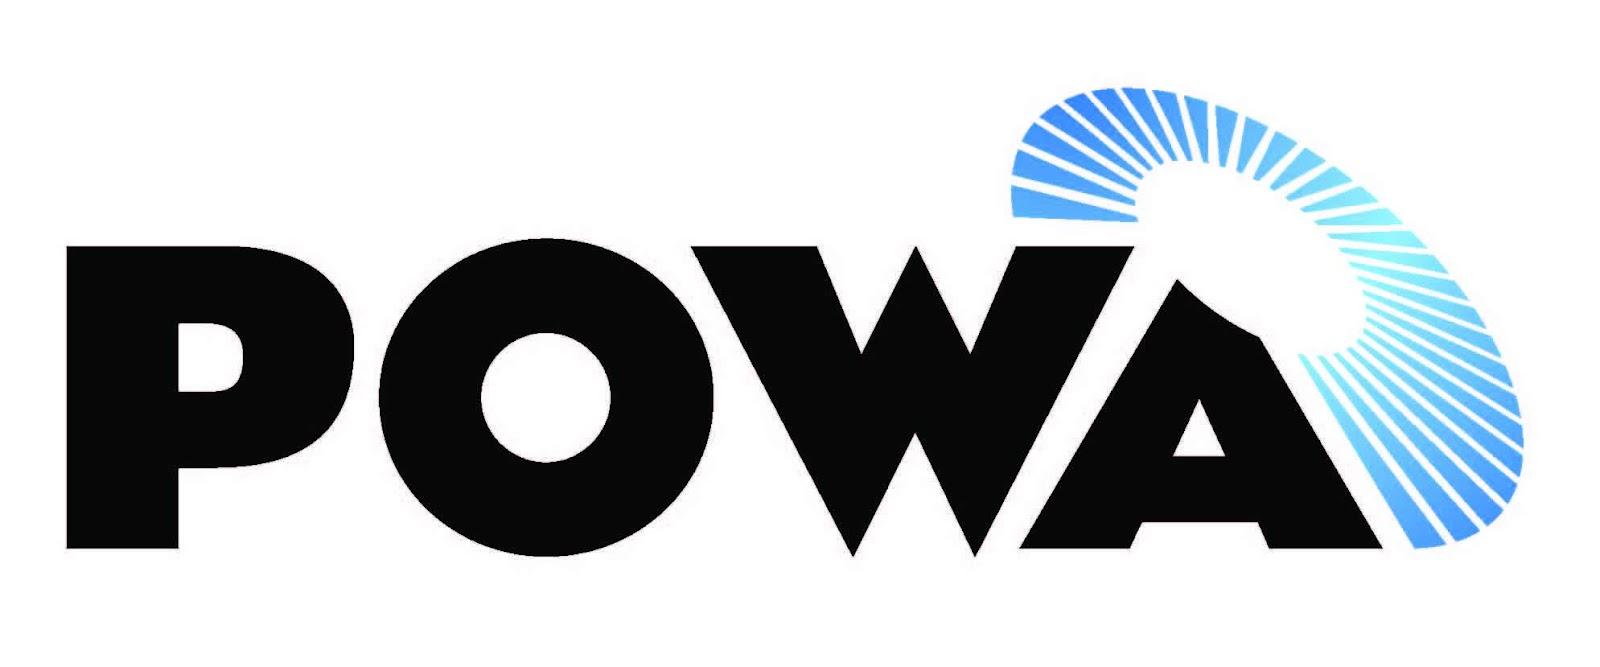 Powa-Technologies-Goes-Mobile.jpg